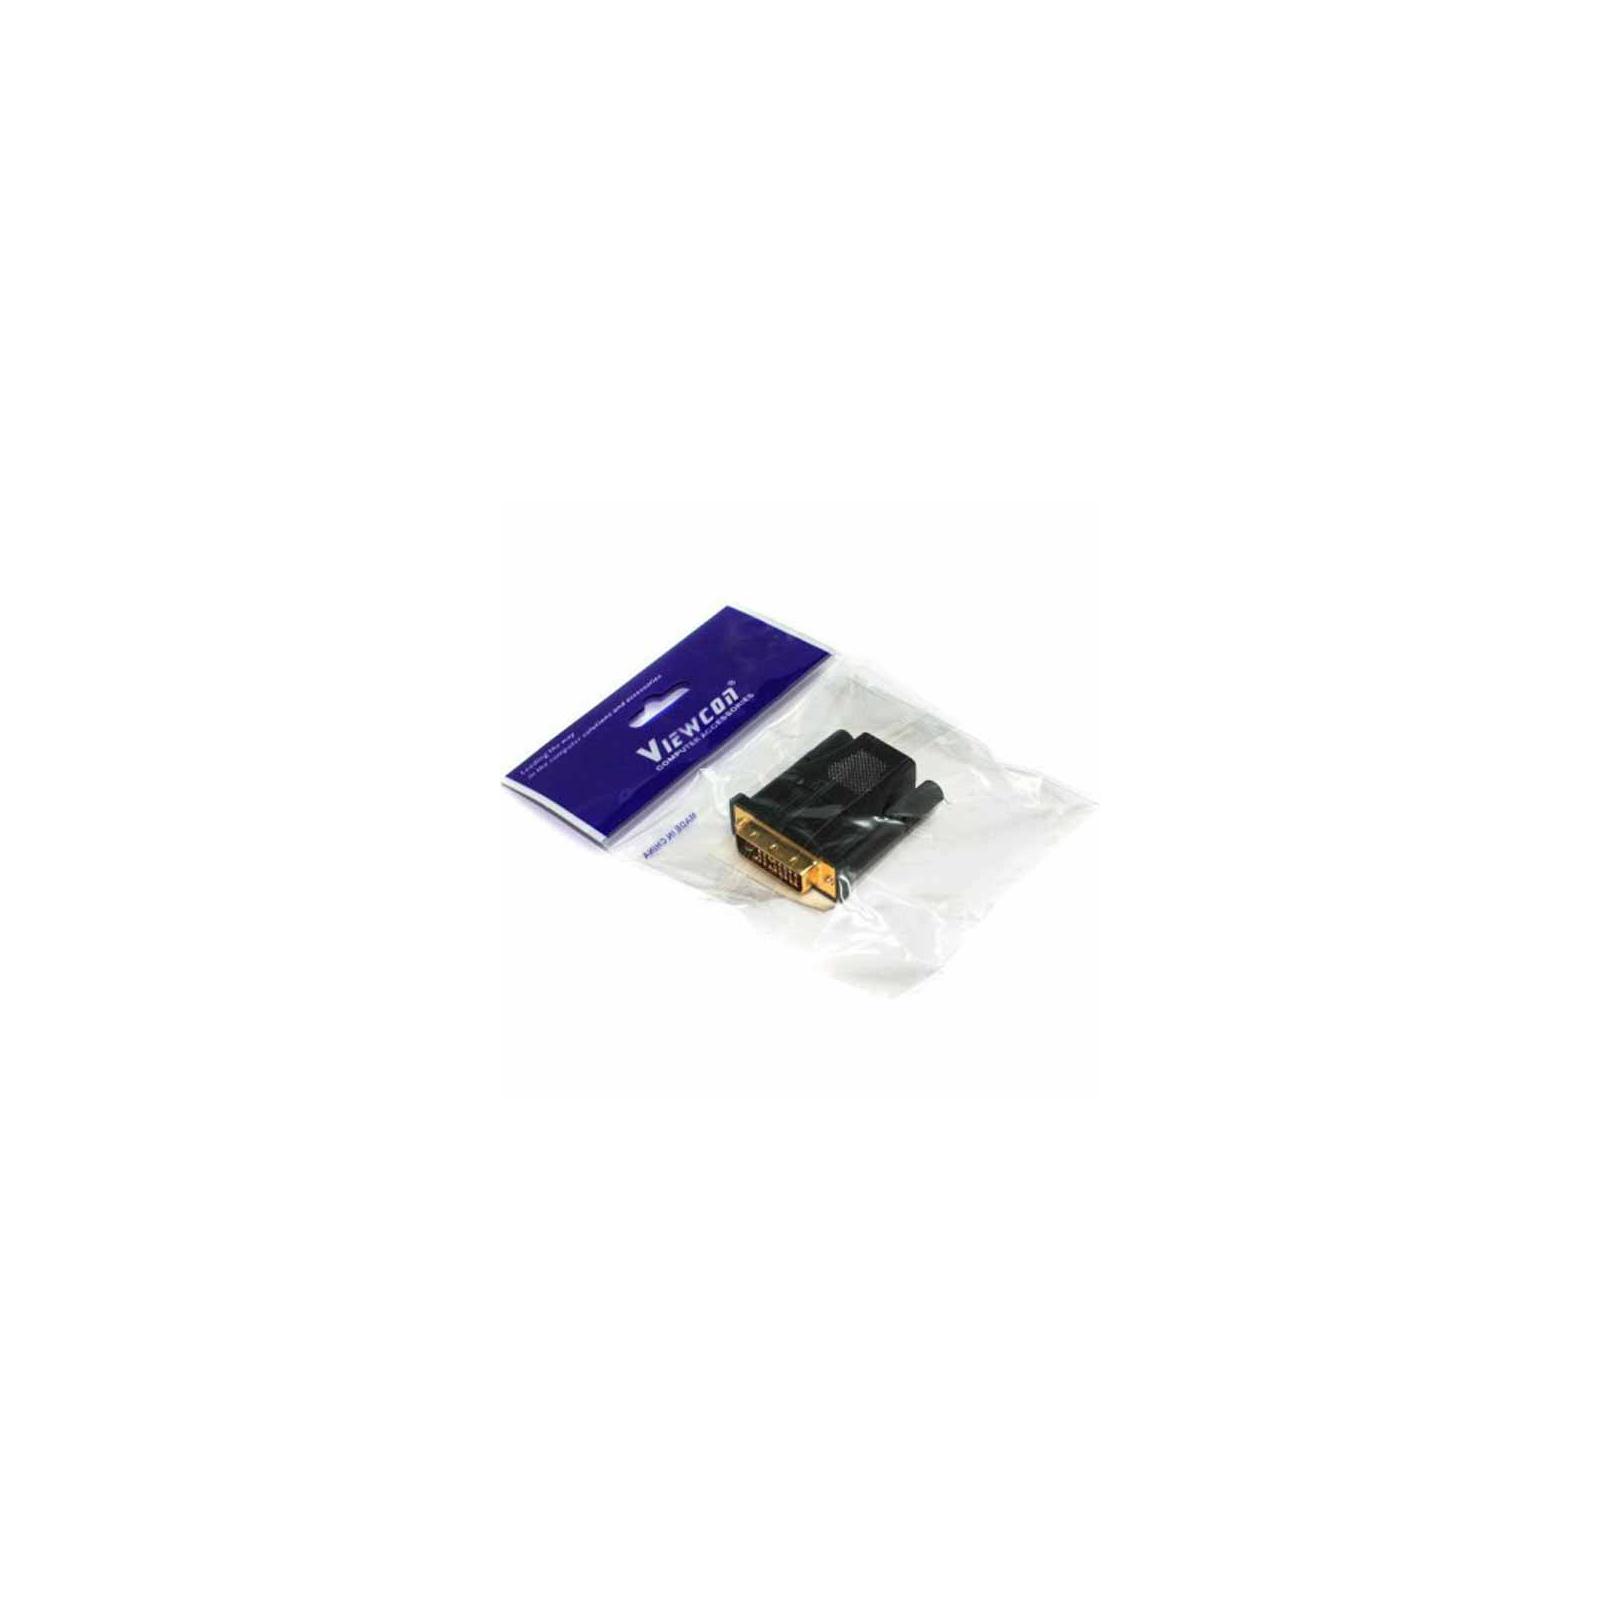 Переходник HDMI AF to DVI M (24+1) Viewcon (VD 037 B) изображение 3